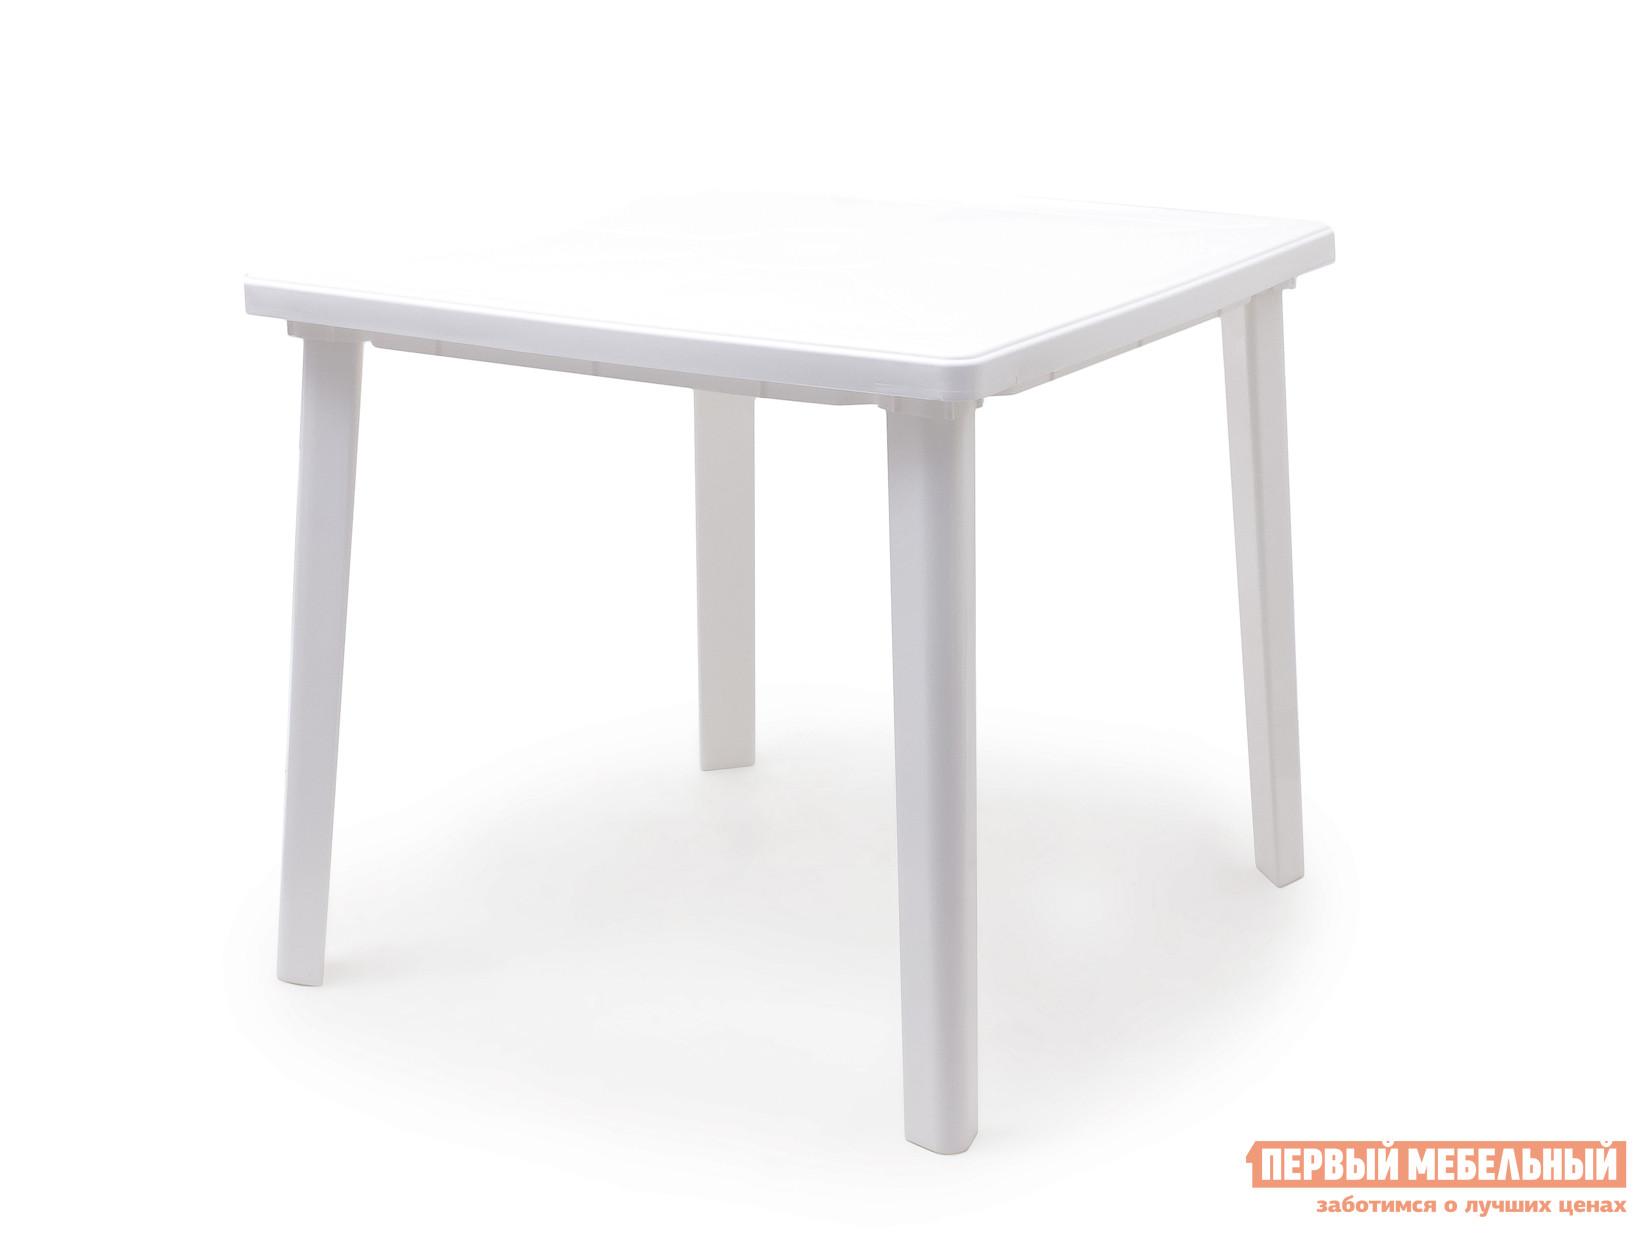 Пластиковый стол Стандарт Пластик Стол квадратный (800х800х710) Белый